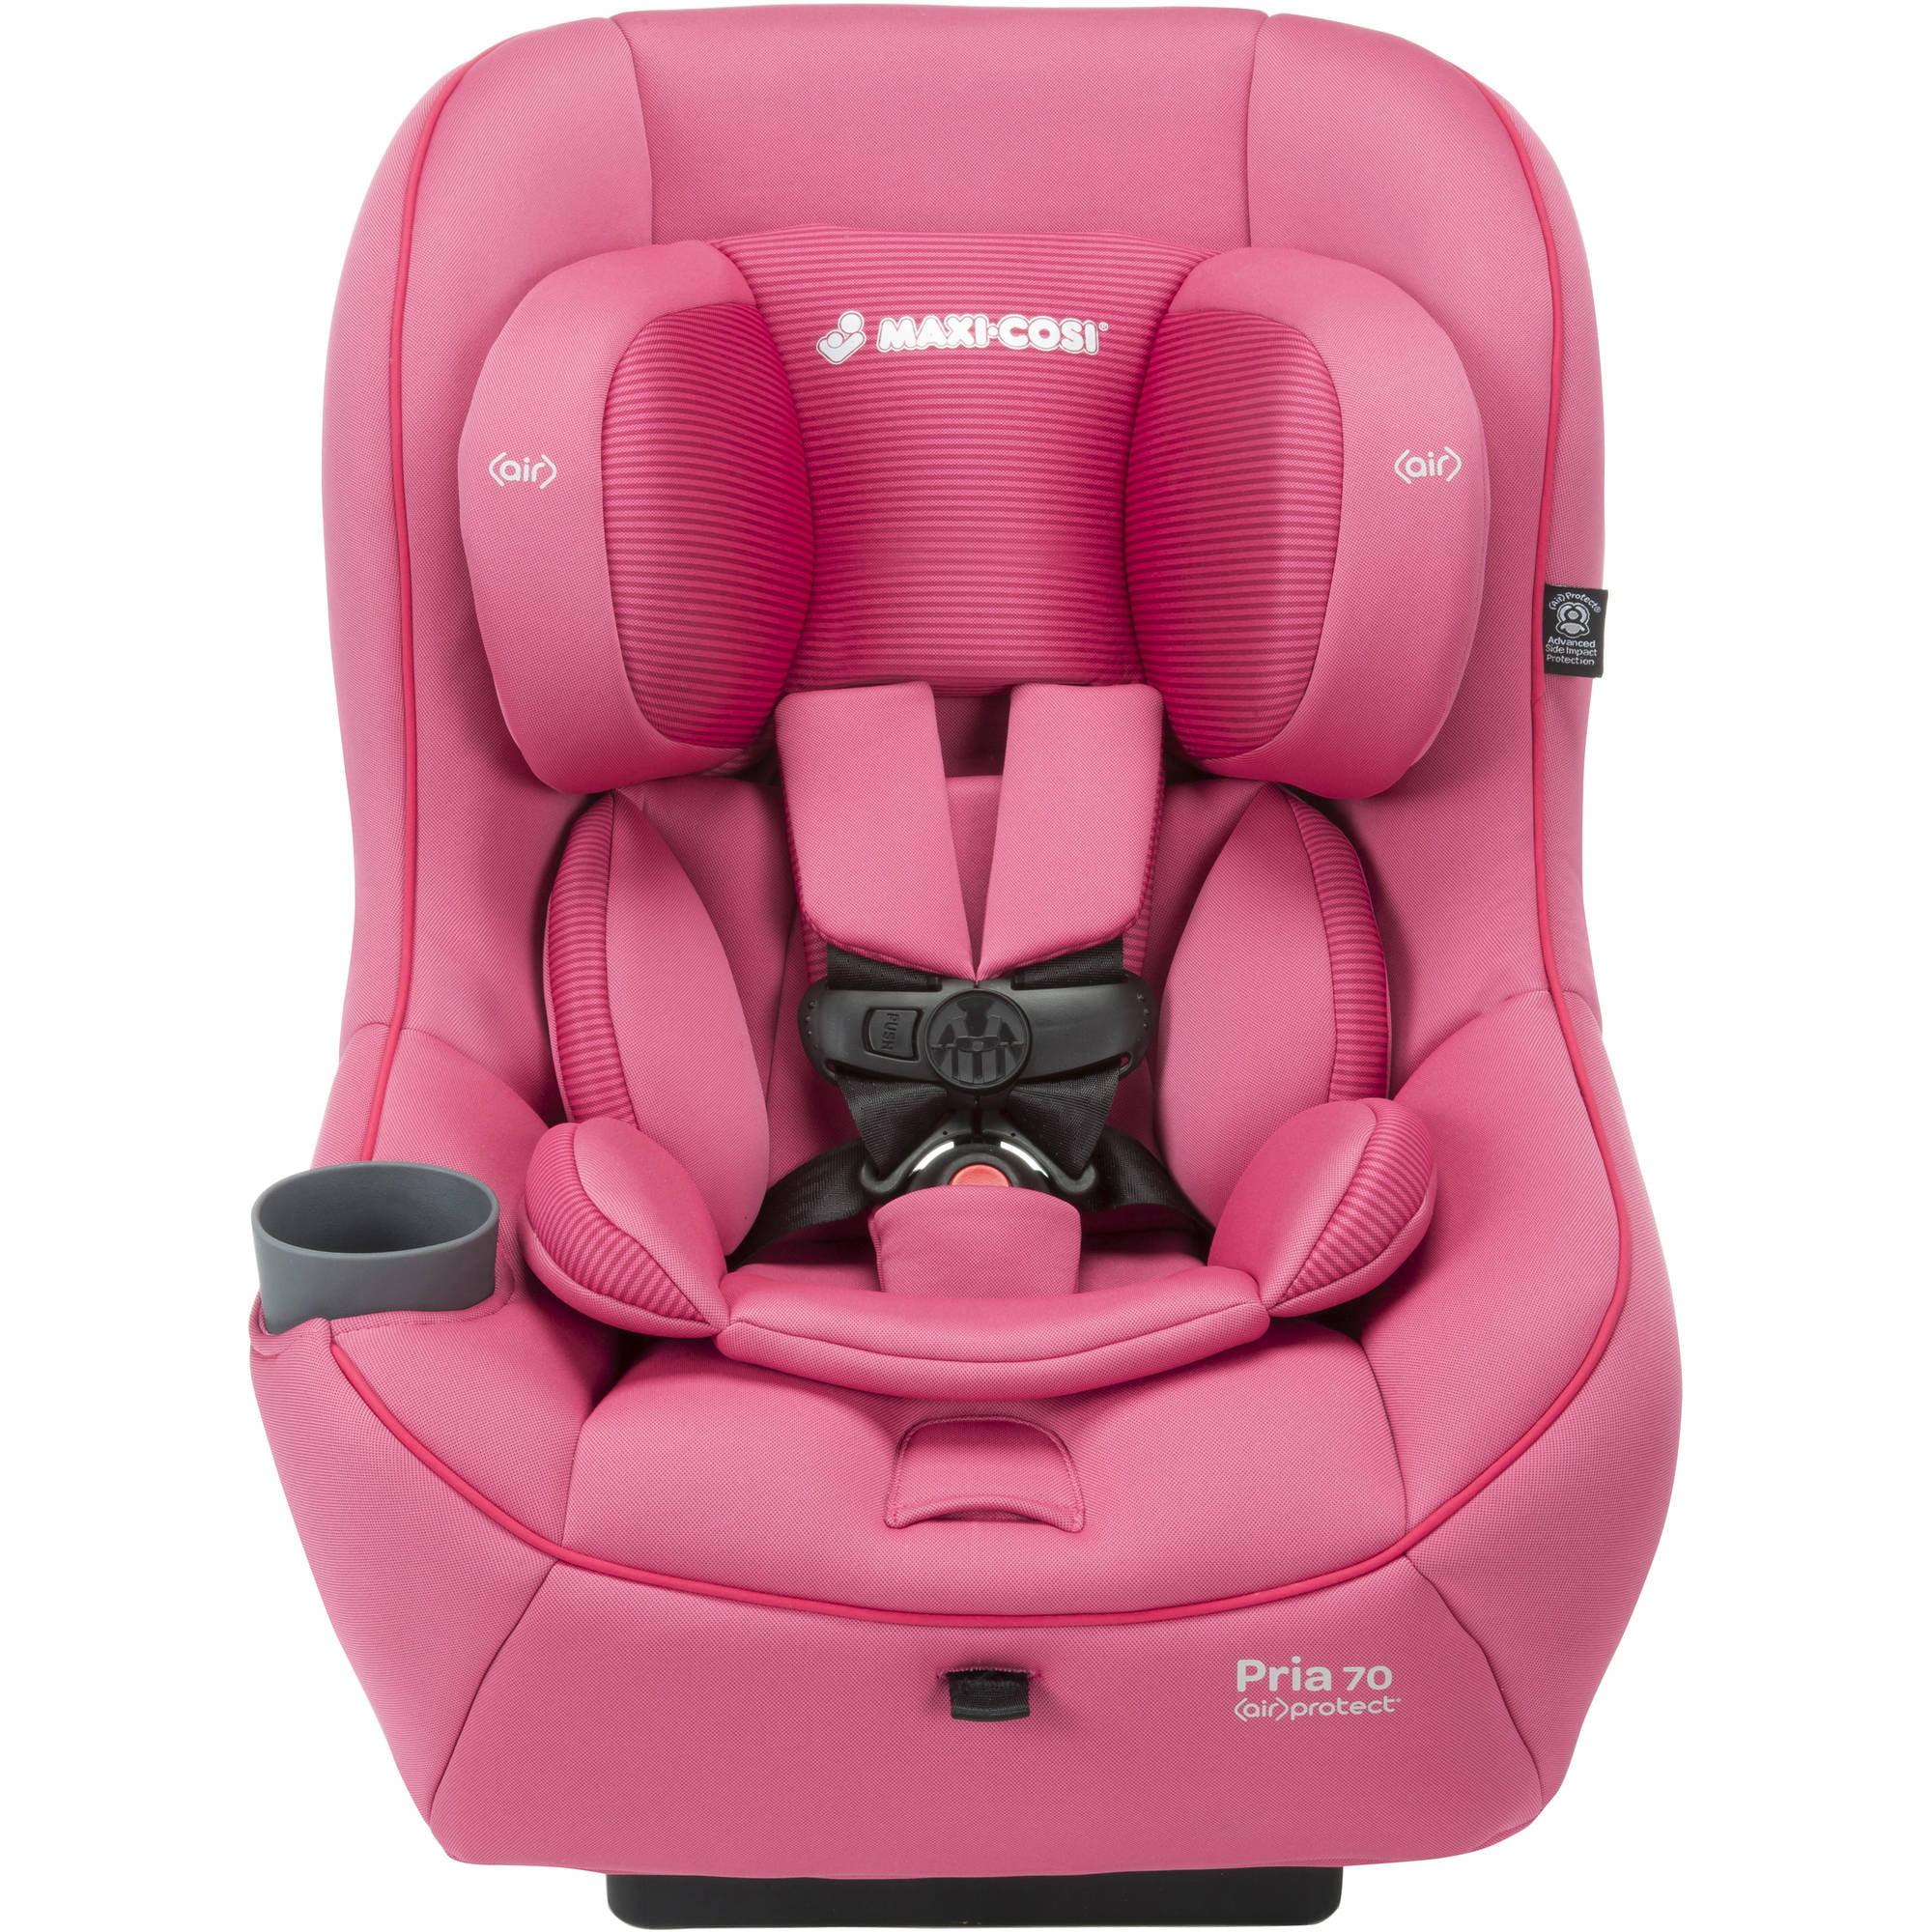 Maxi cosi pria 70 convertible car seat choose your color walmart com